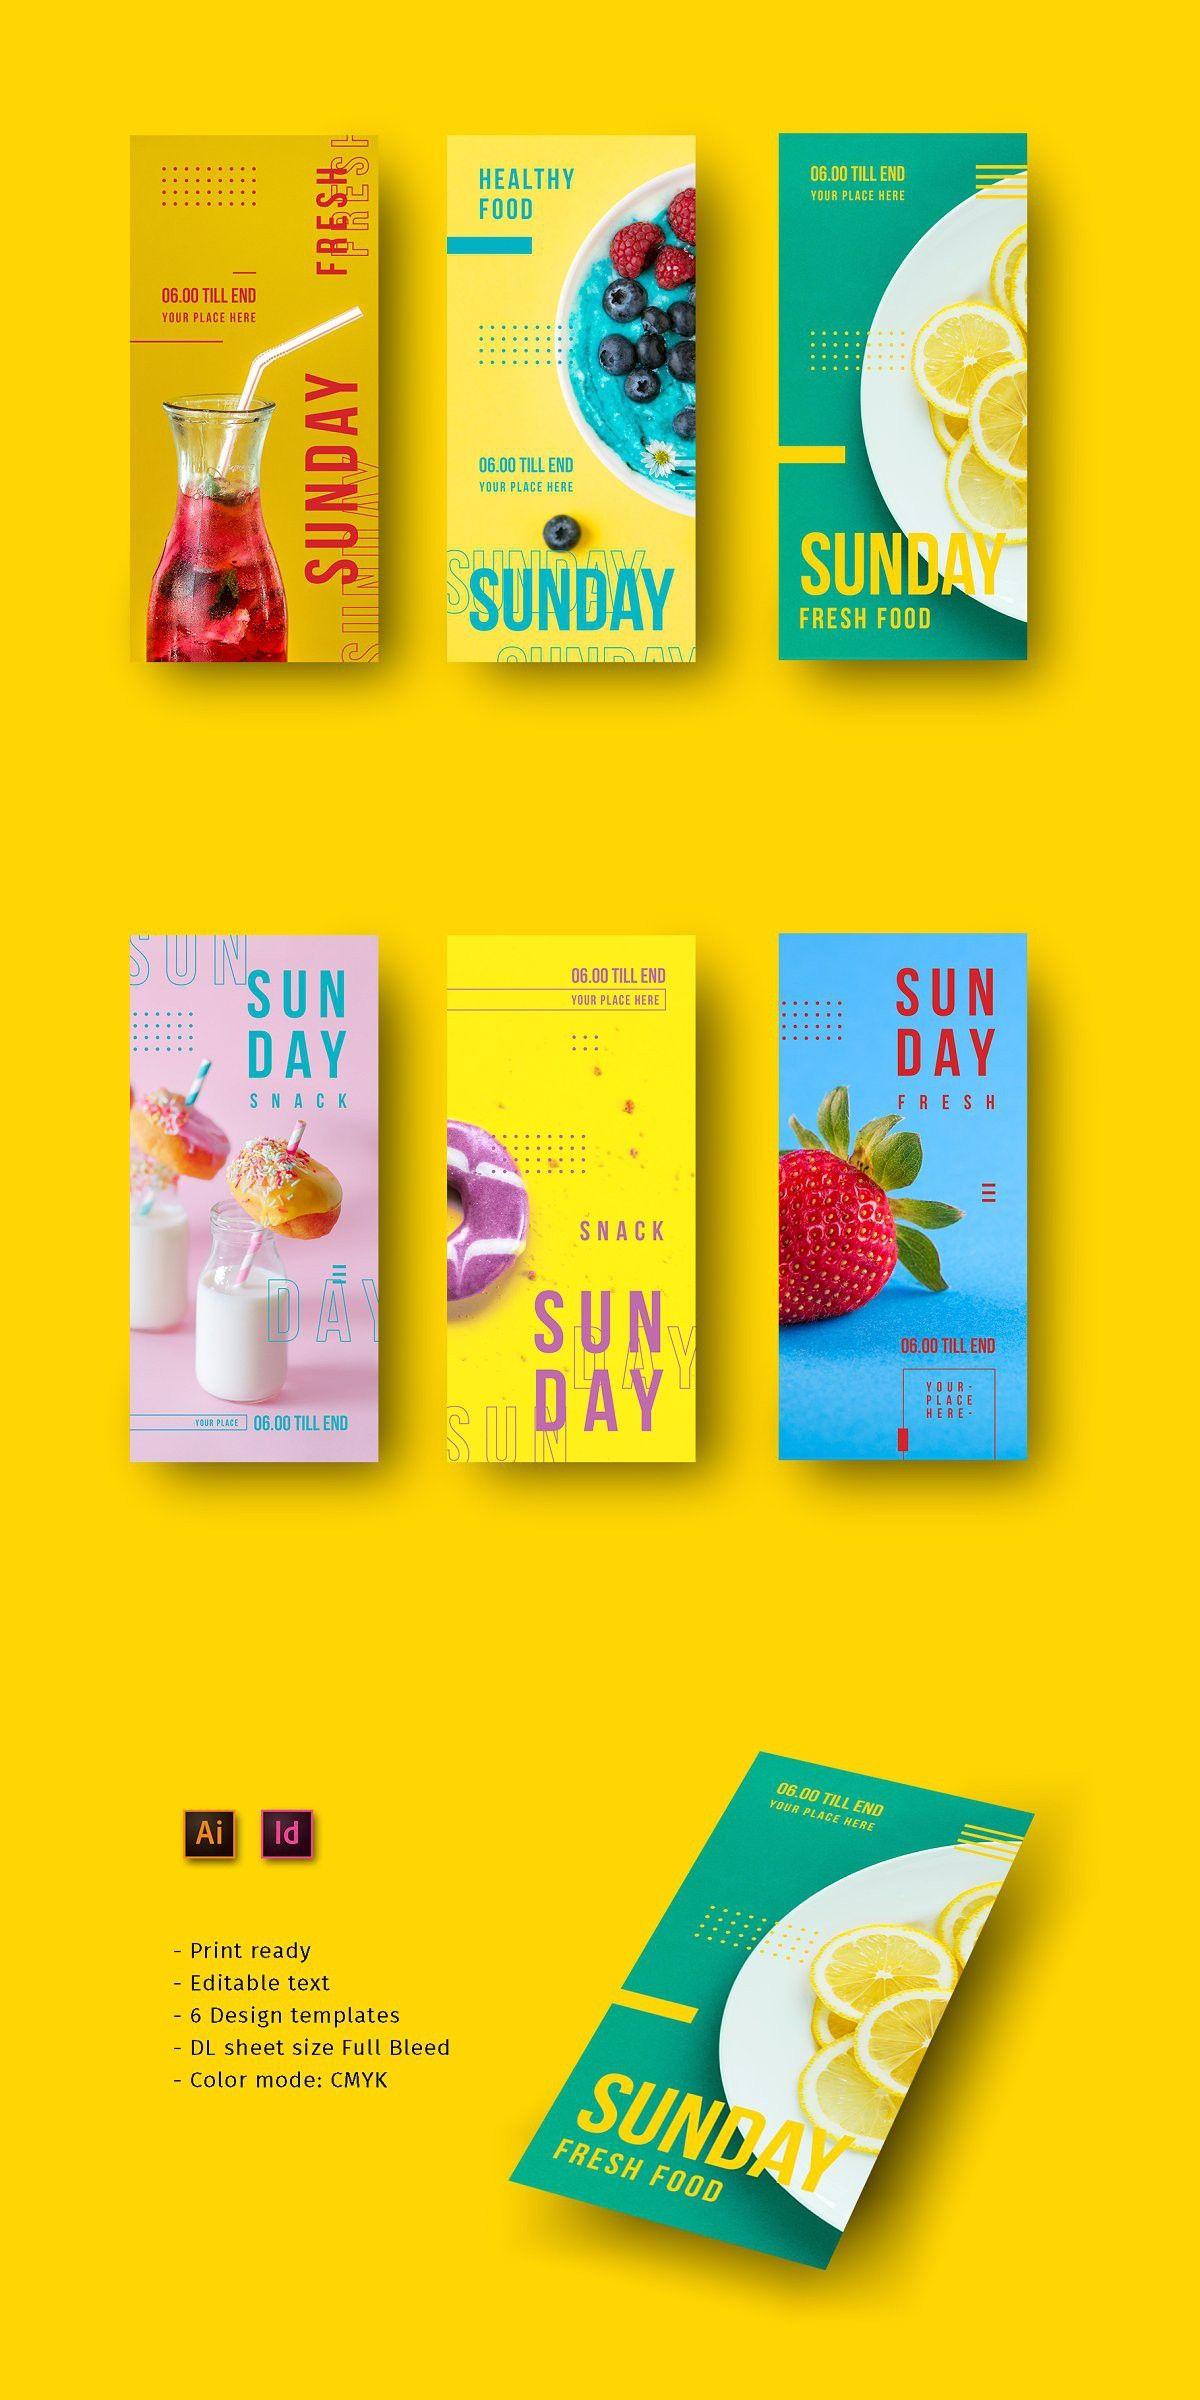 Sunday Snack Flyer Poster Makanan Referensi Desain Desain